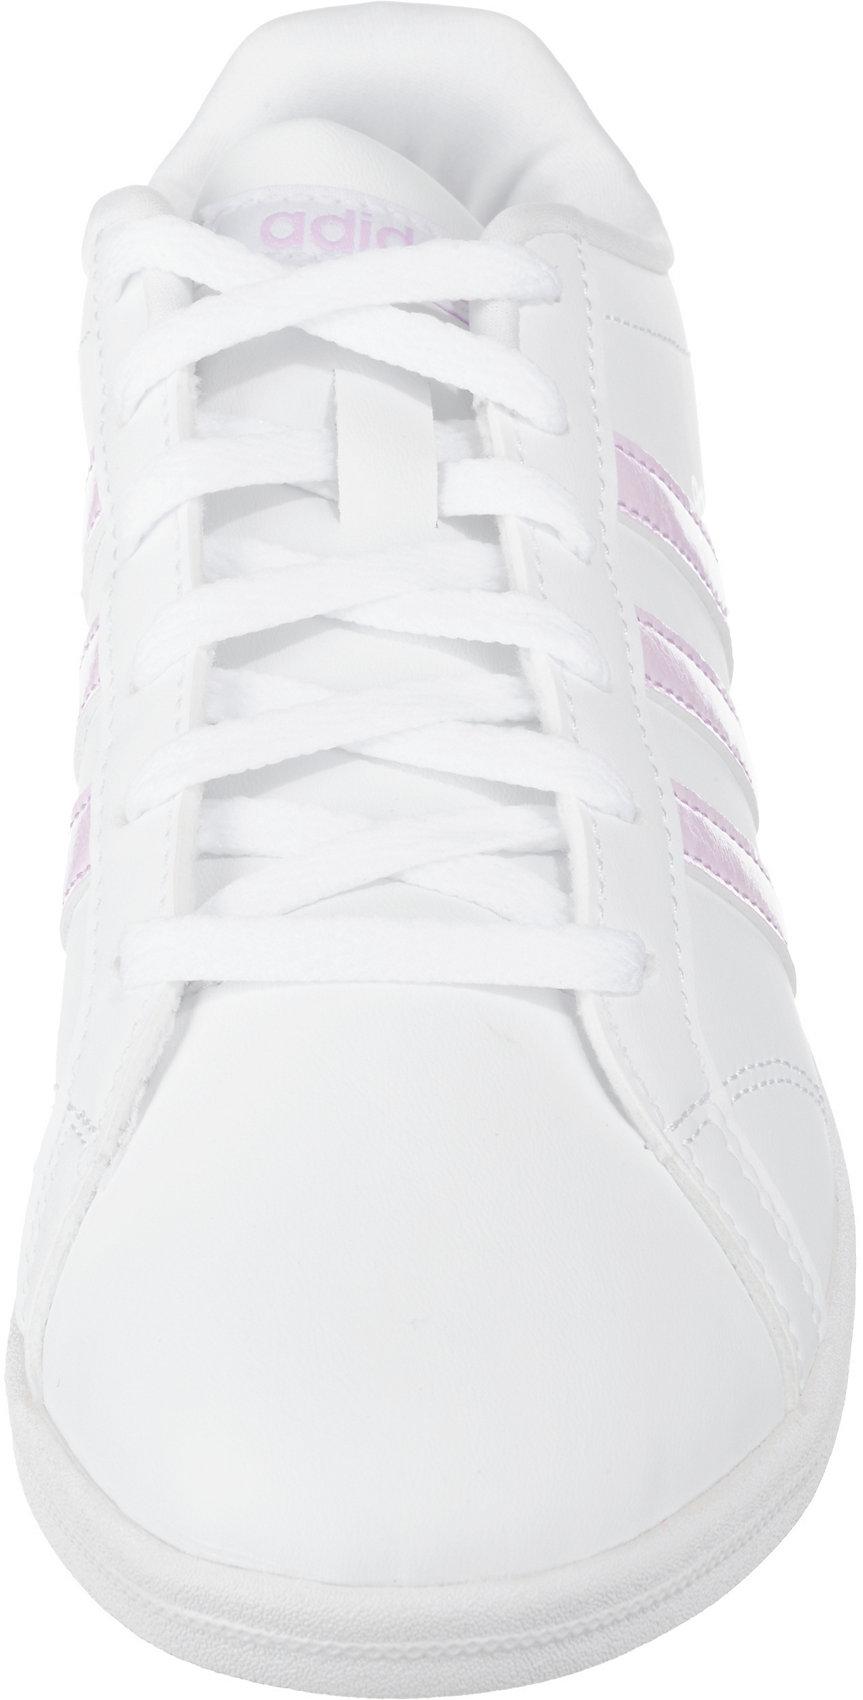 Details zu Neu adidas Sport Inspired Coneo Qt Sneakers Low 7501669 für Damen